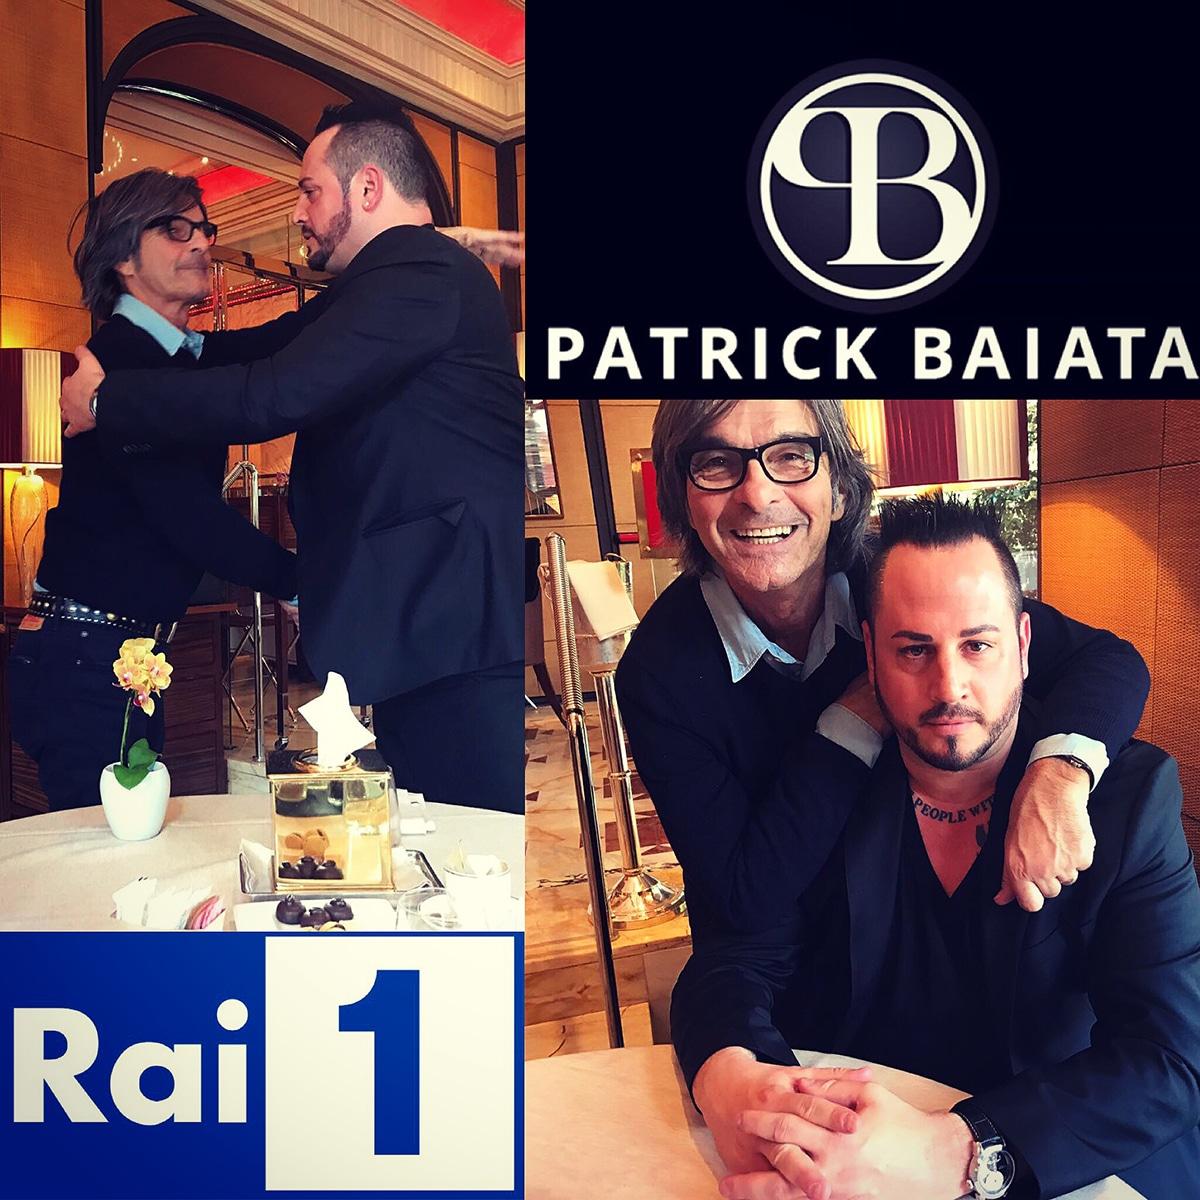 patrick-baiata-meets-robert-alessi